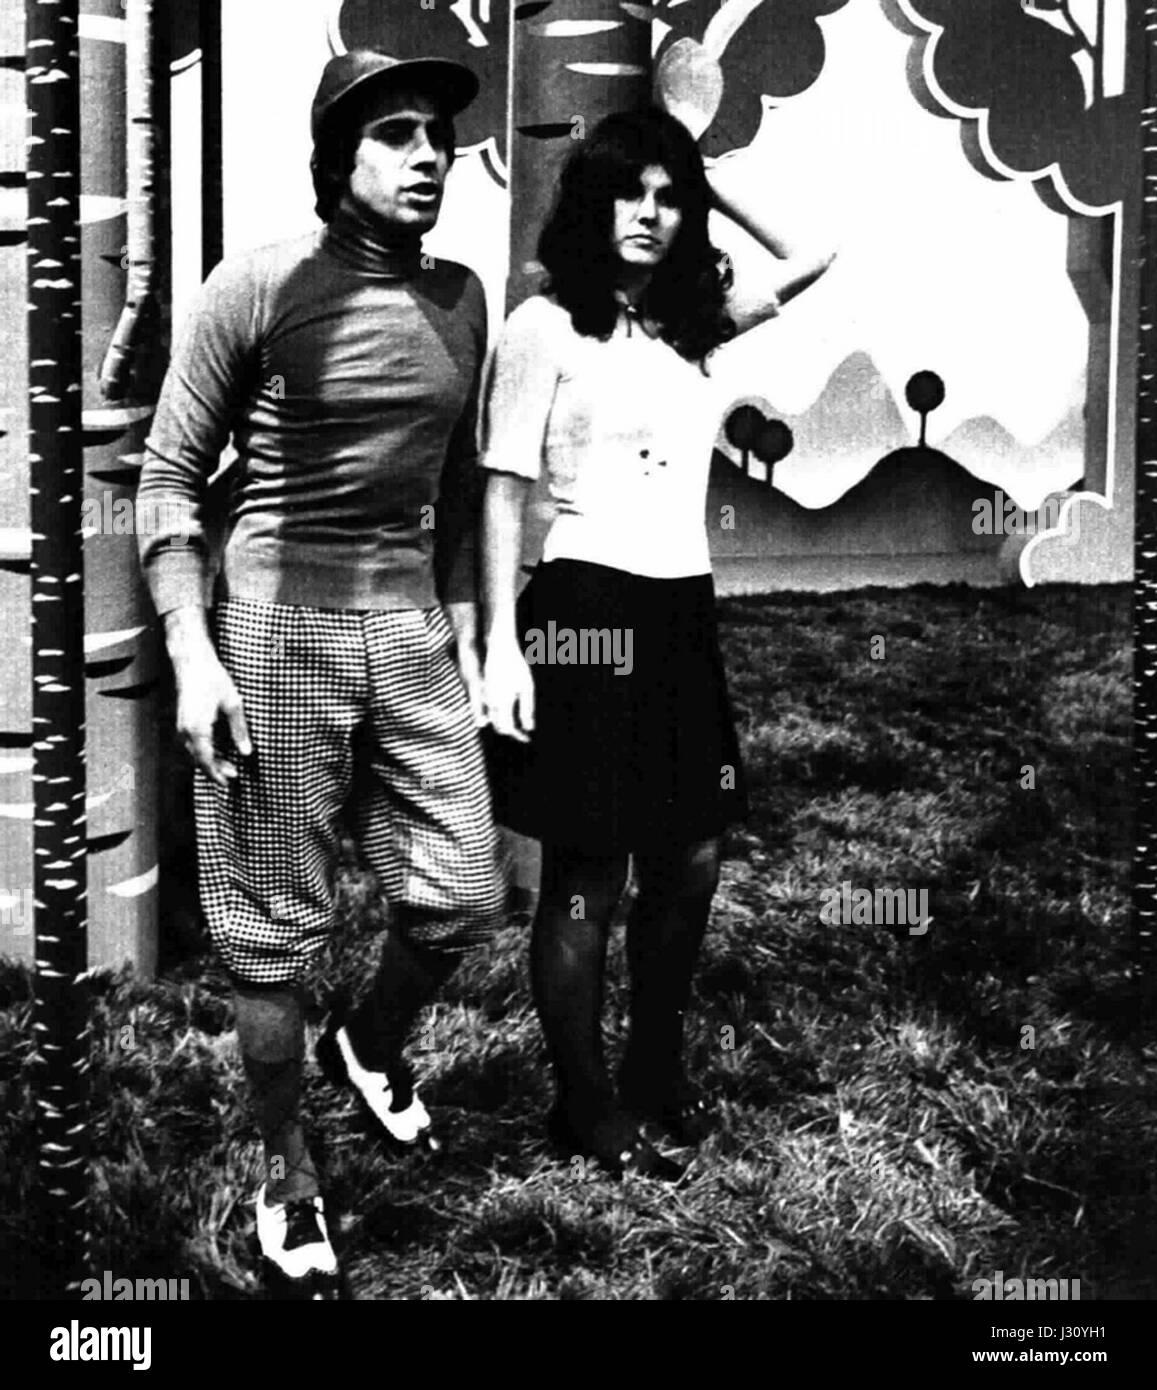 Adriano Celentano and Claudia Mori - Stock Image